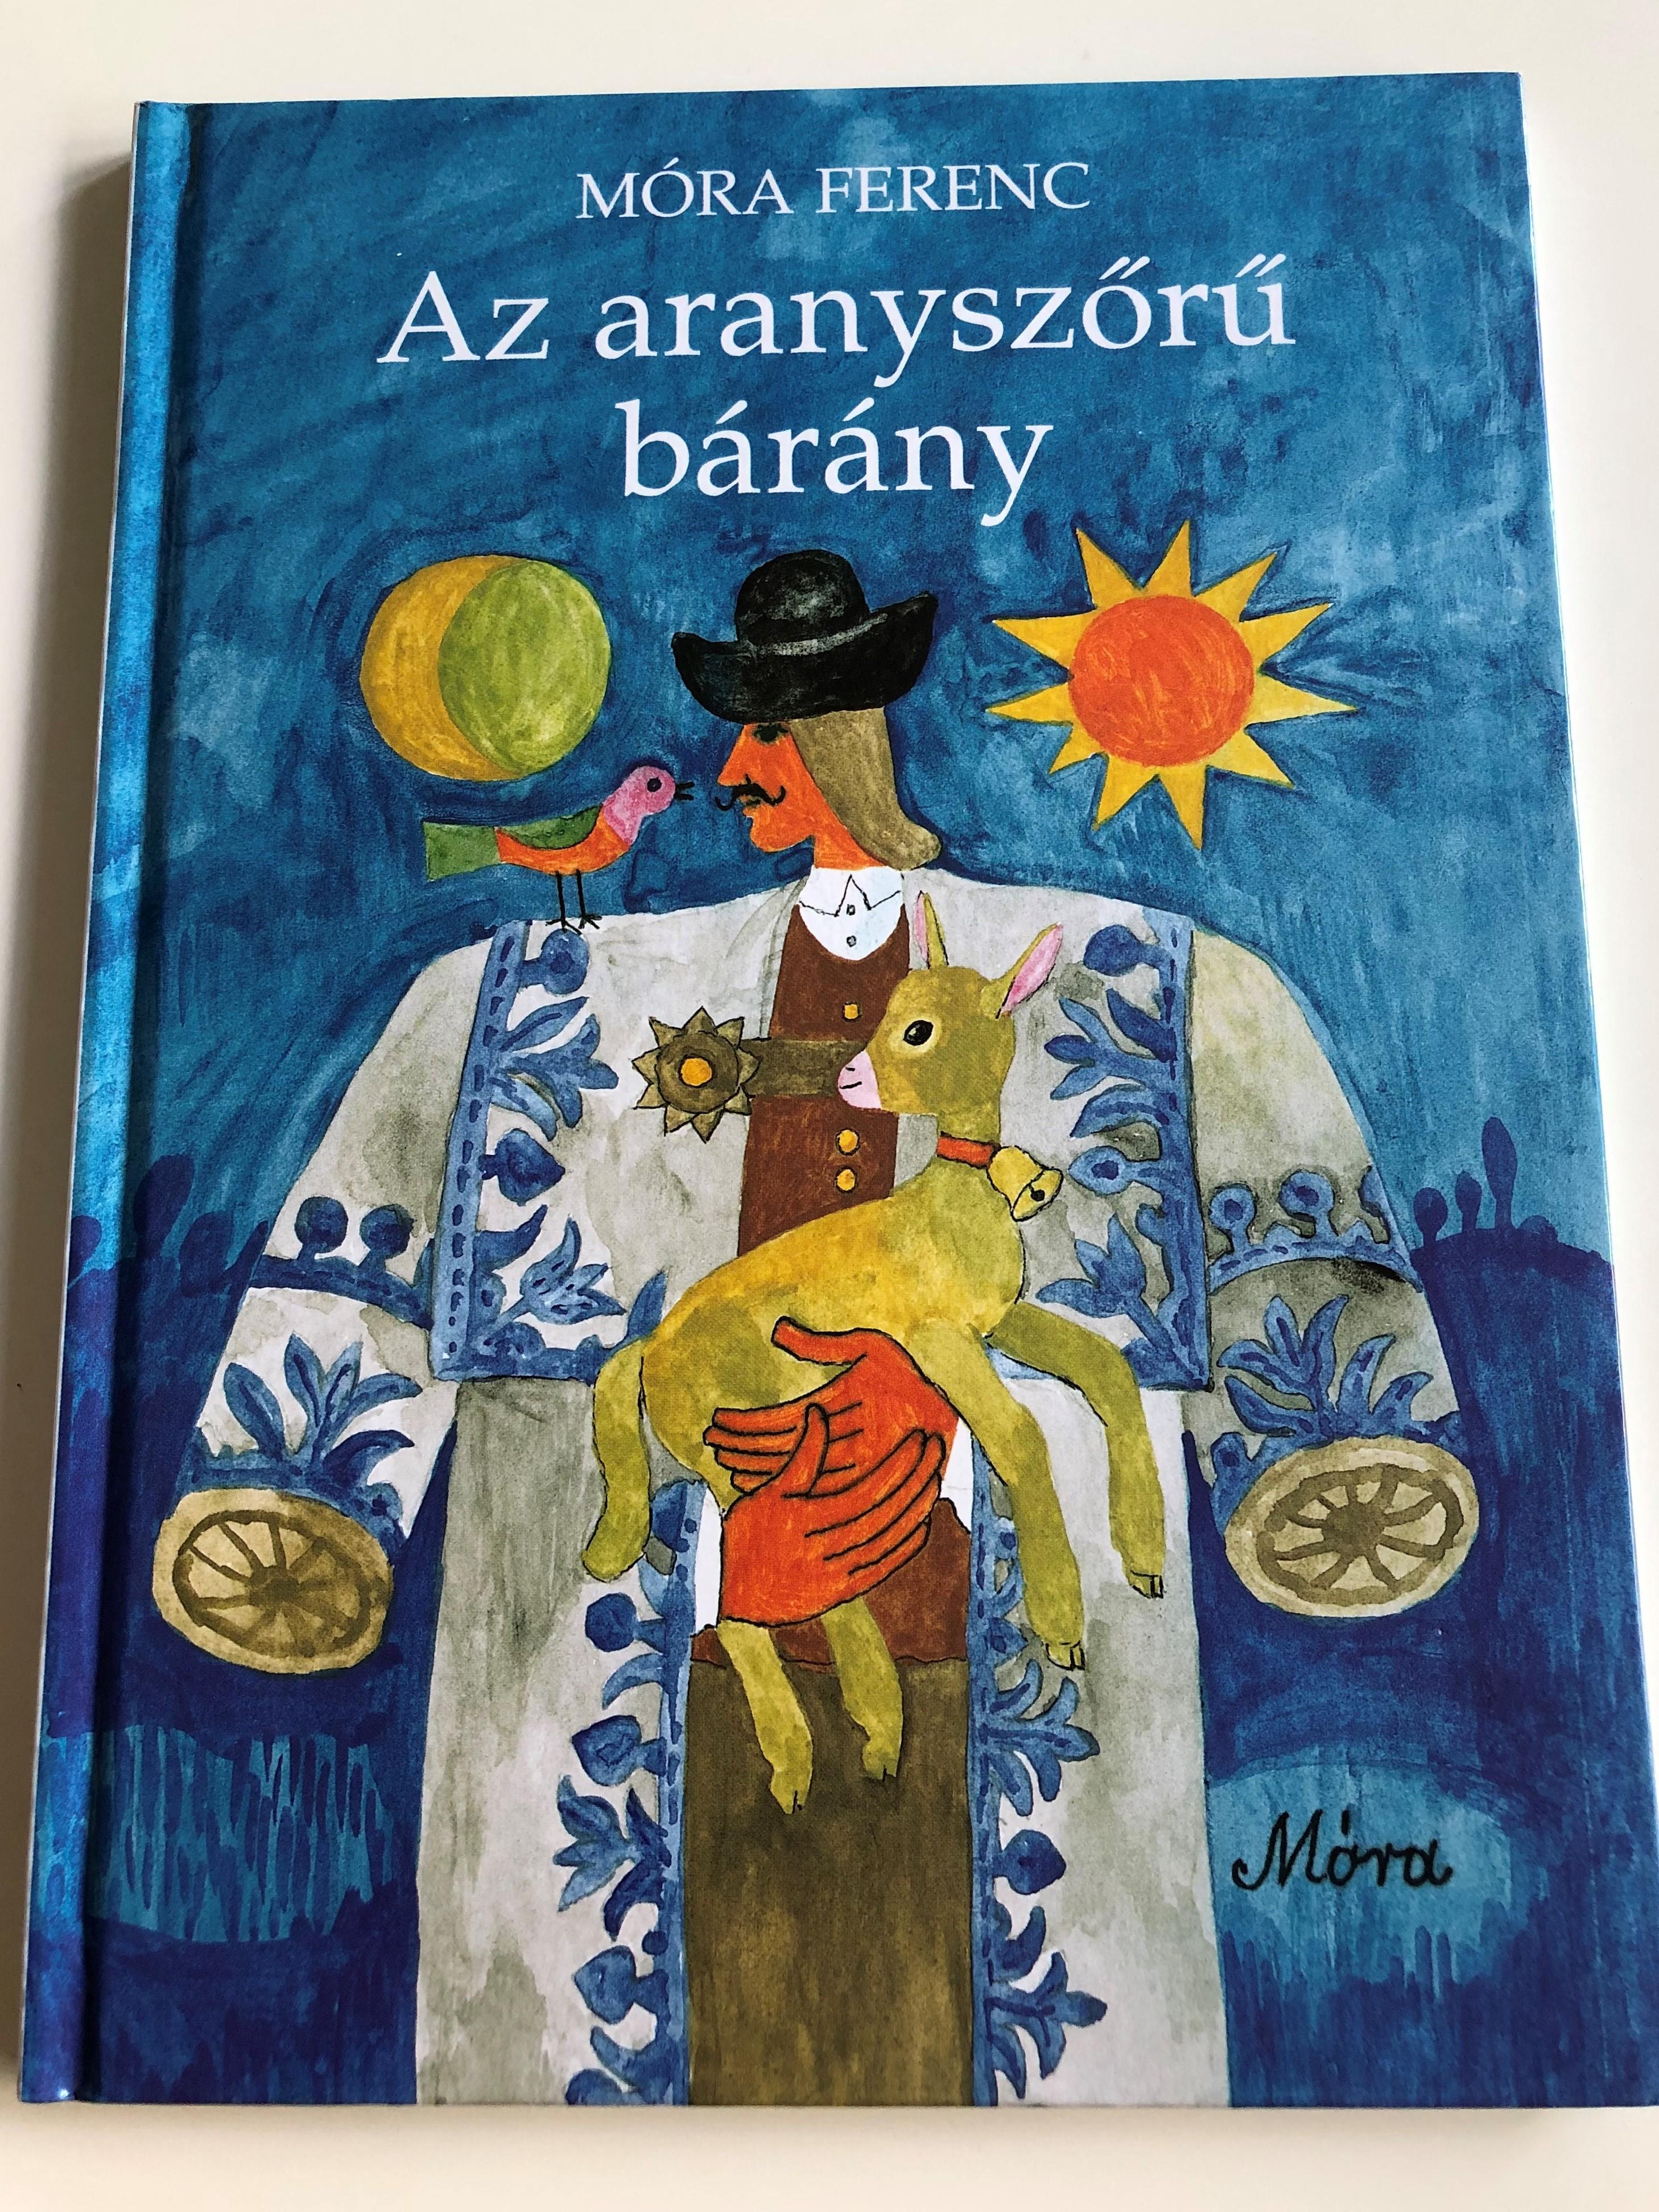 az-aranysz-r-b-r-ny-by-m-ra-ferenc-hungarian-folk-tale-reich-k-roly-rajzaival-5th-edition-m-ra-k-nyvkiad-2010-1-.jpg